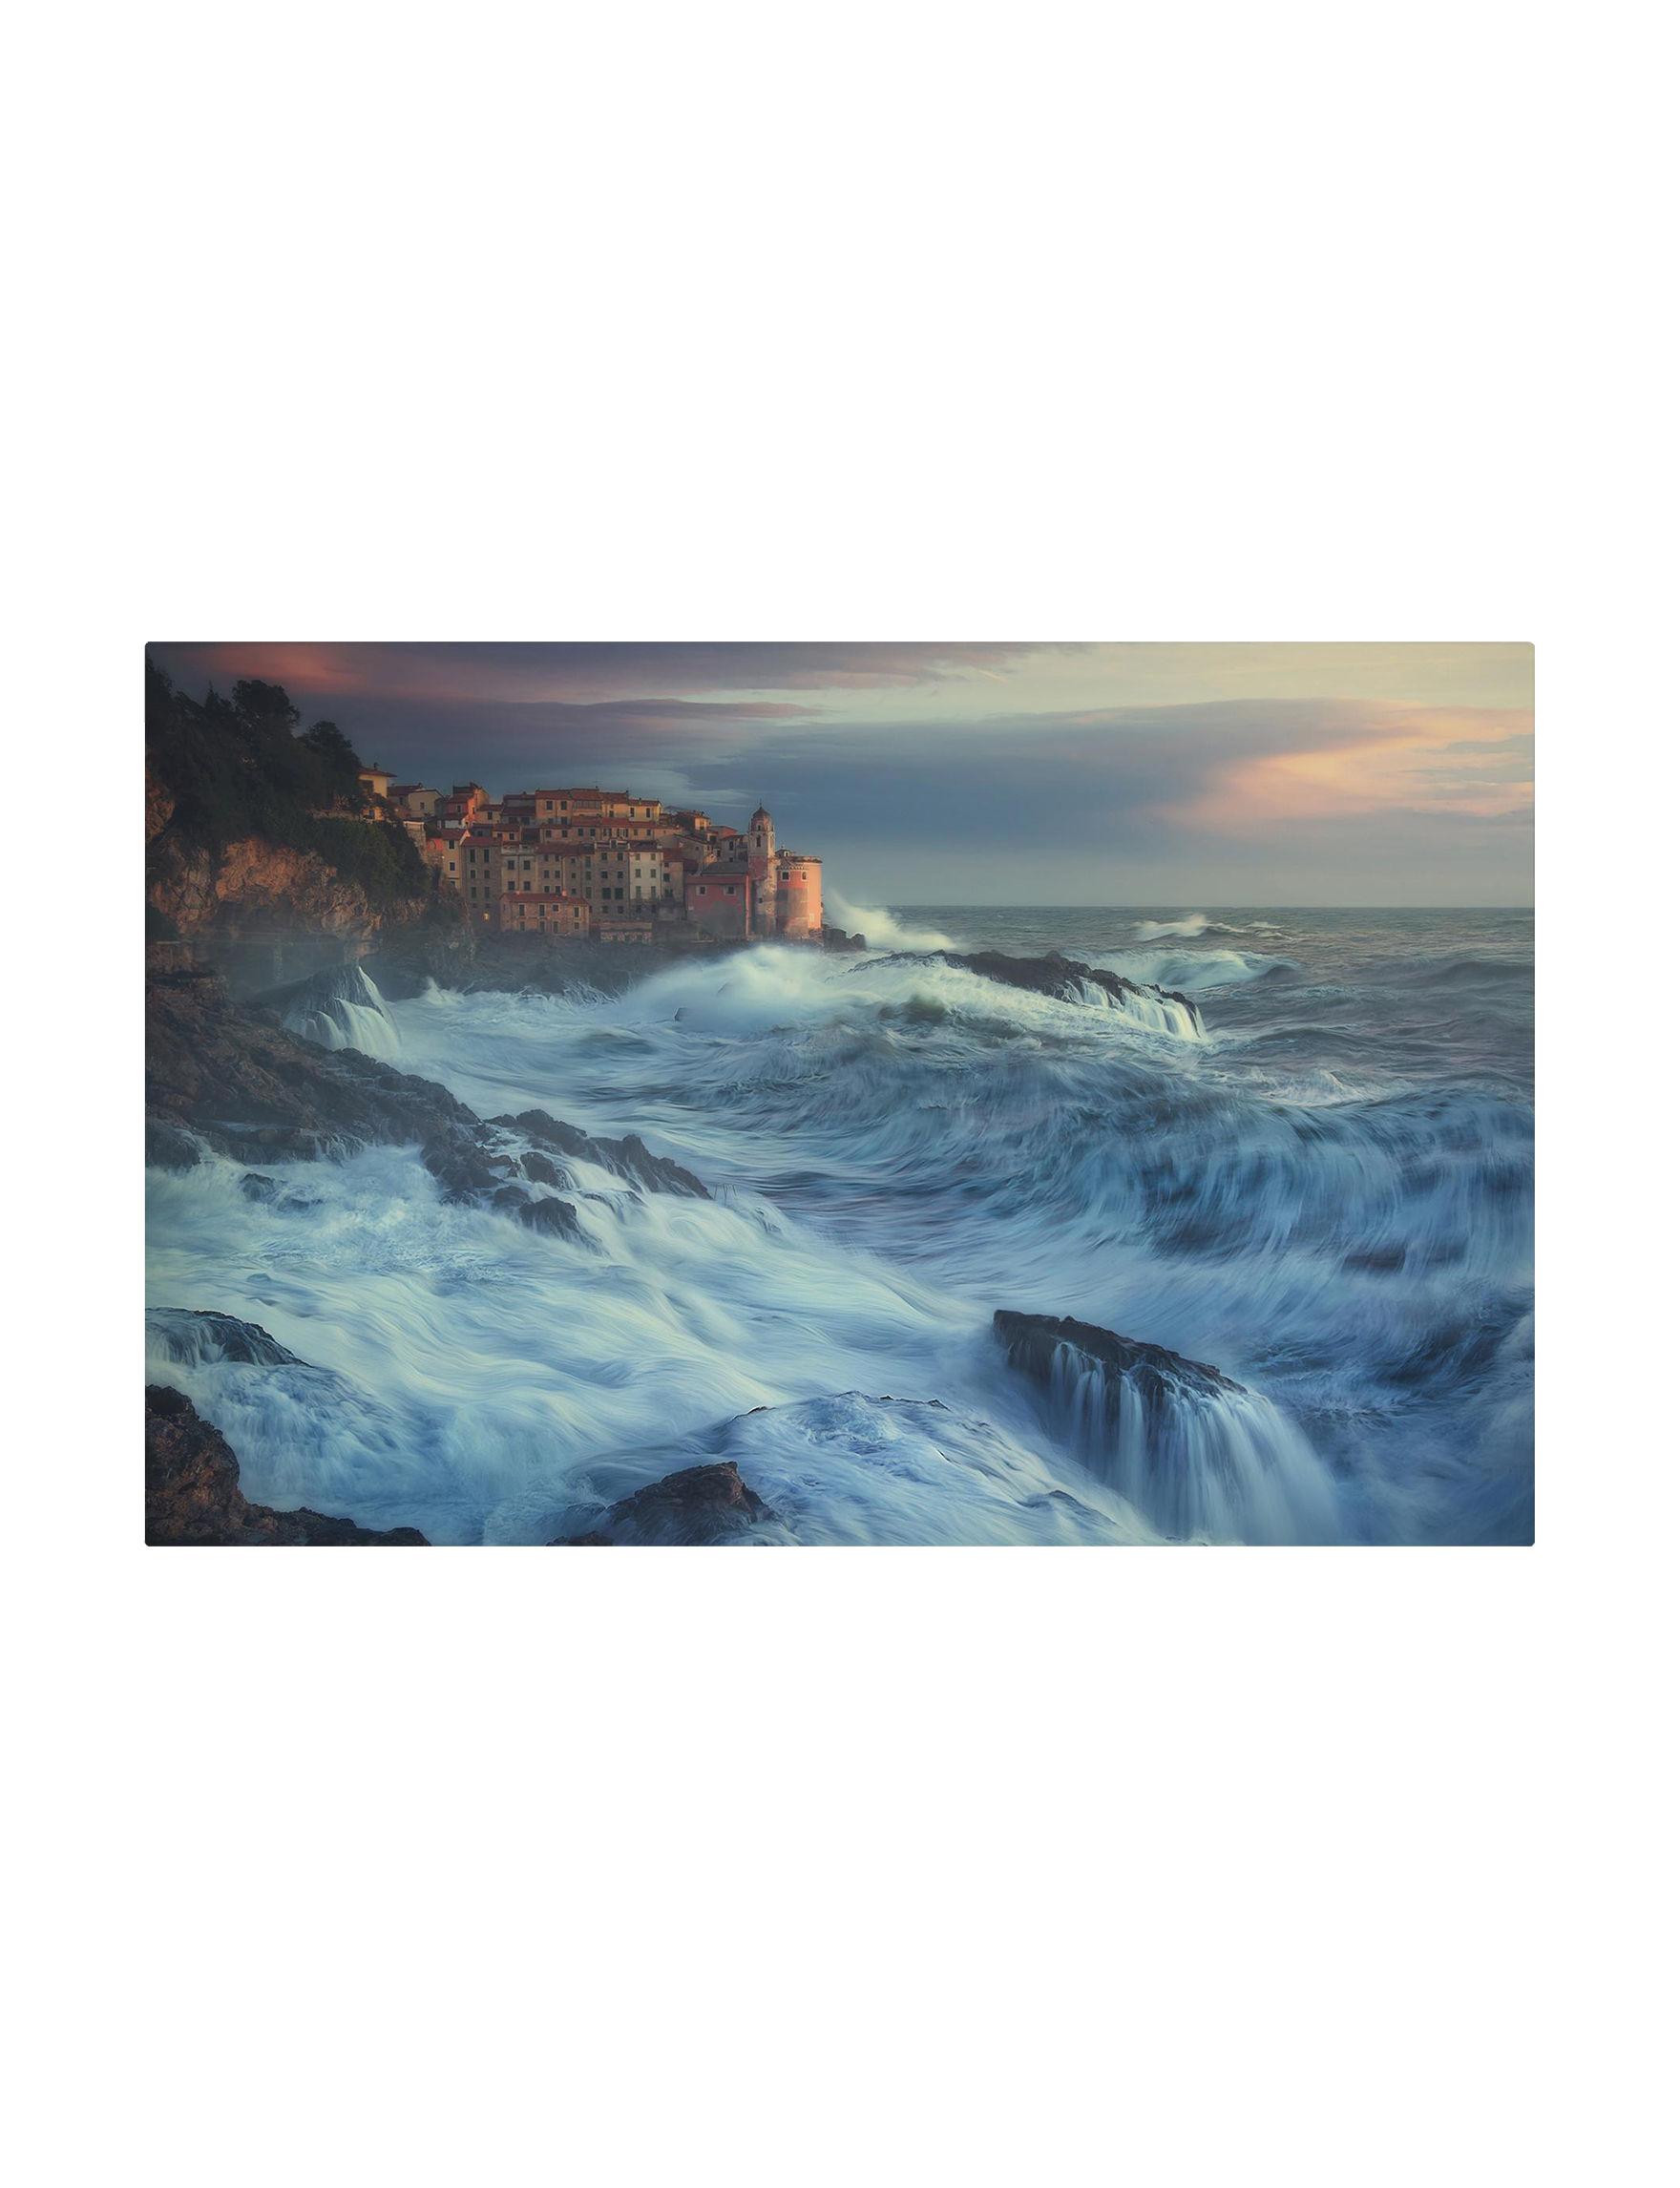 Trademark Fine Art Brown / Blue Wall Art Home Accents Wall Decor